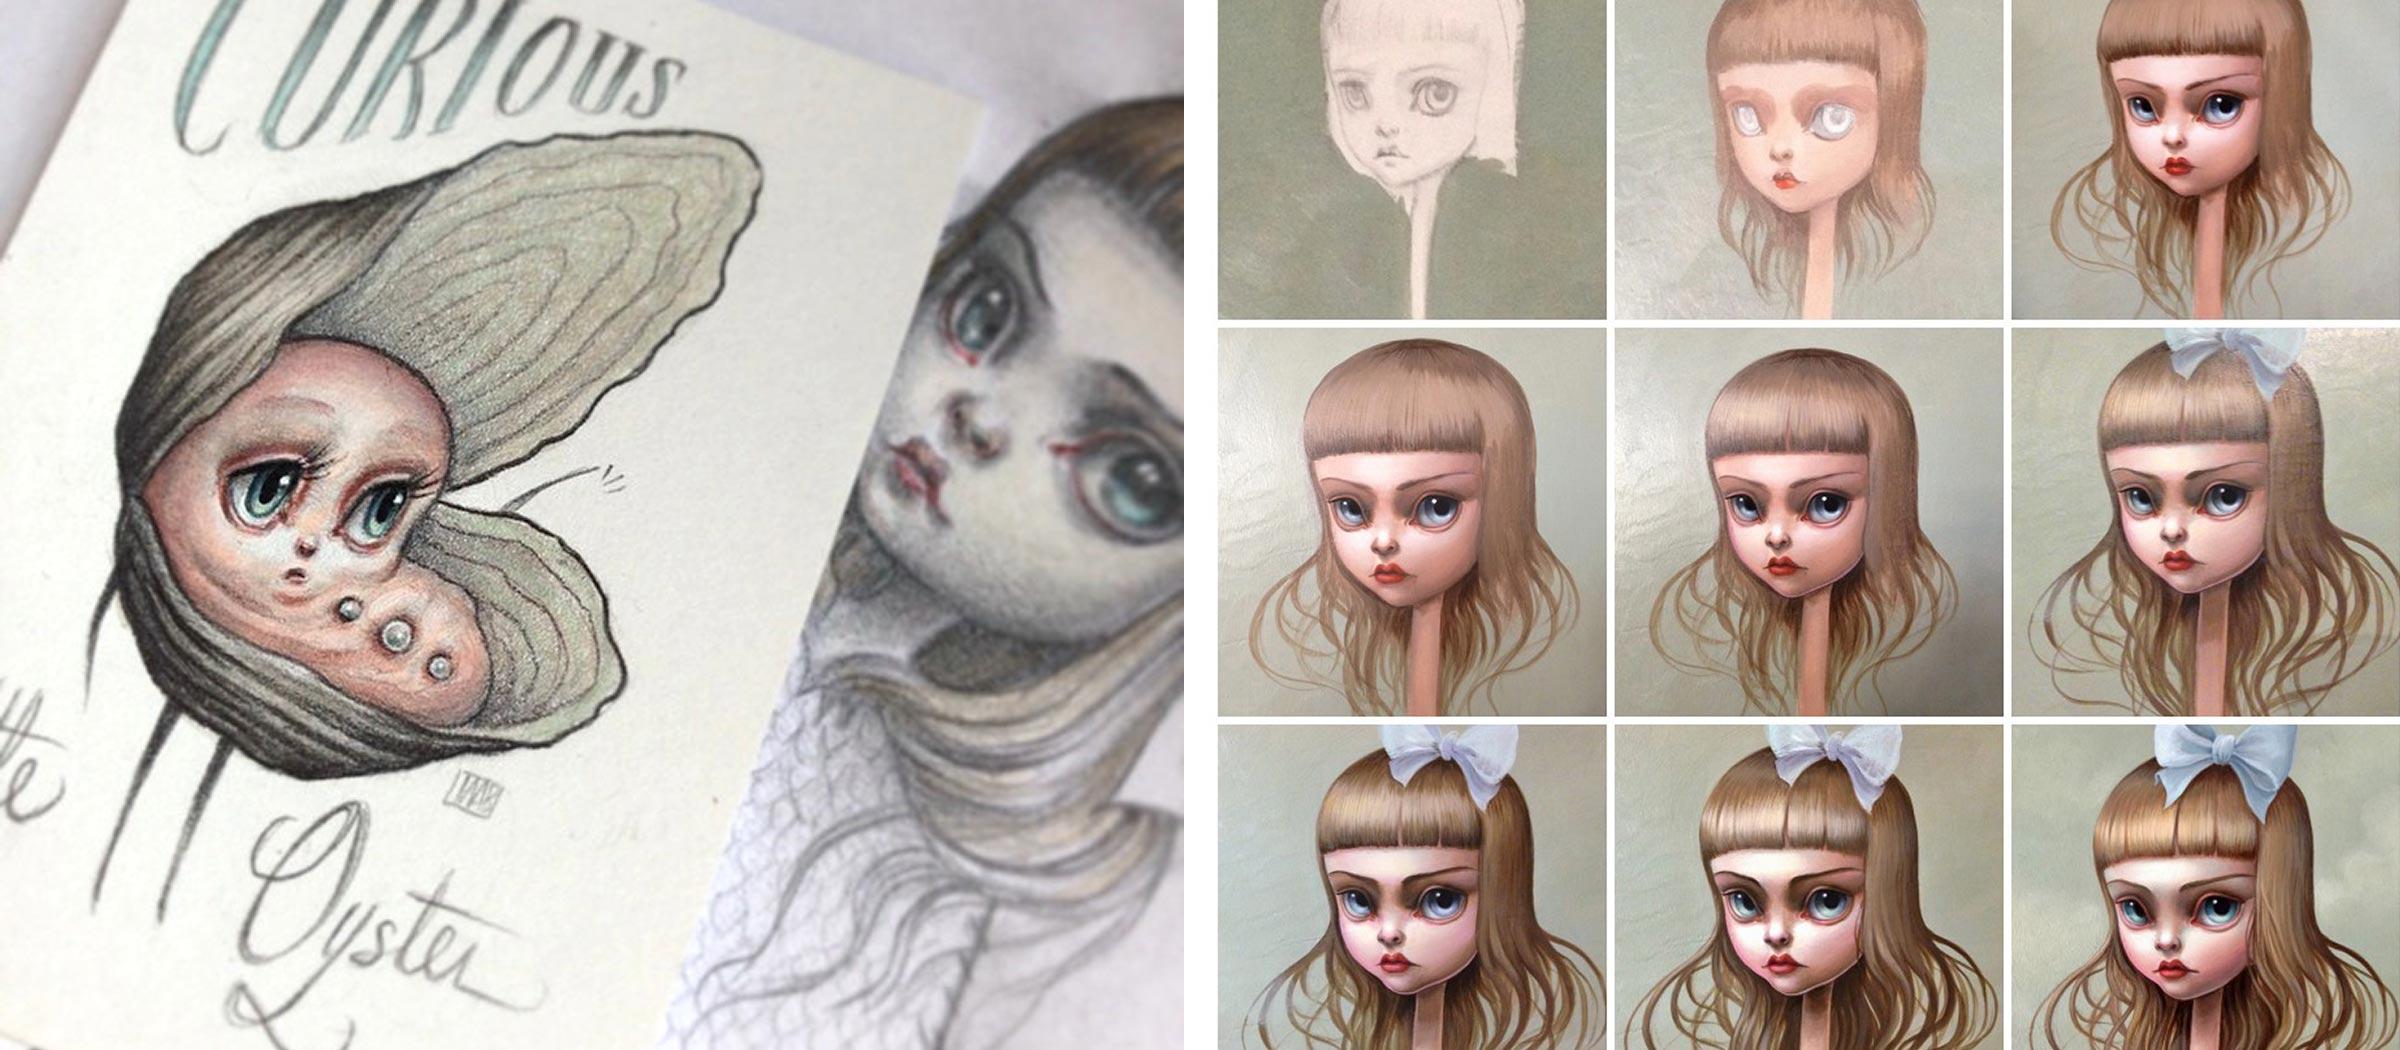 Pivot-Blog-Mab-Graves-Alice-In-Wonderland-Collage-03